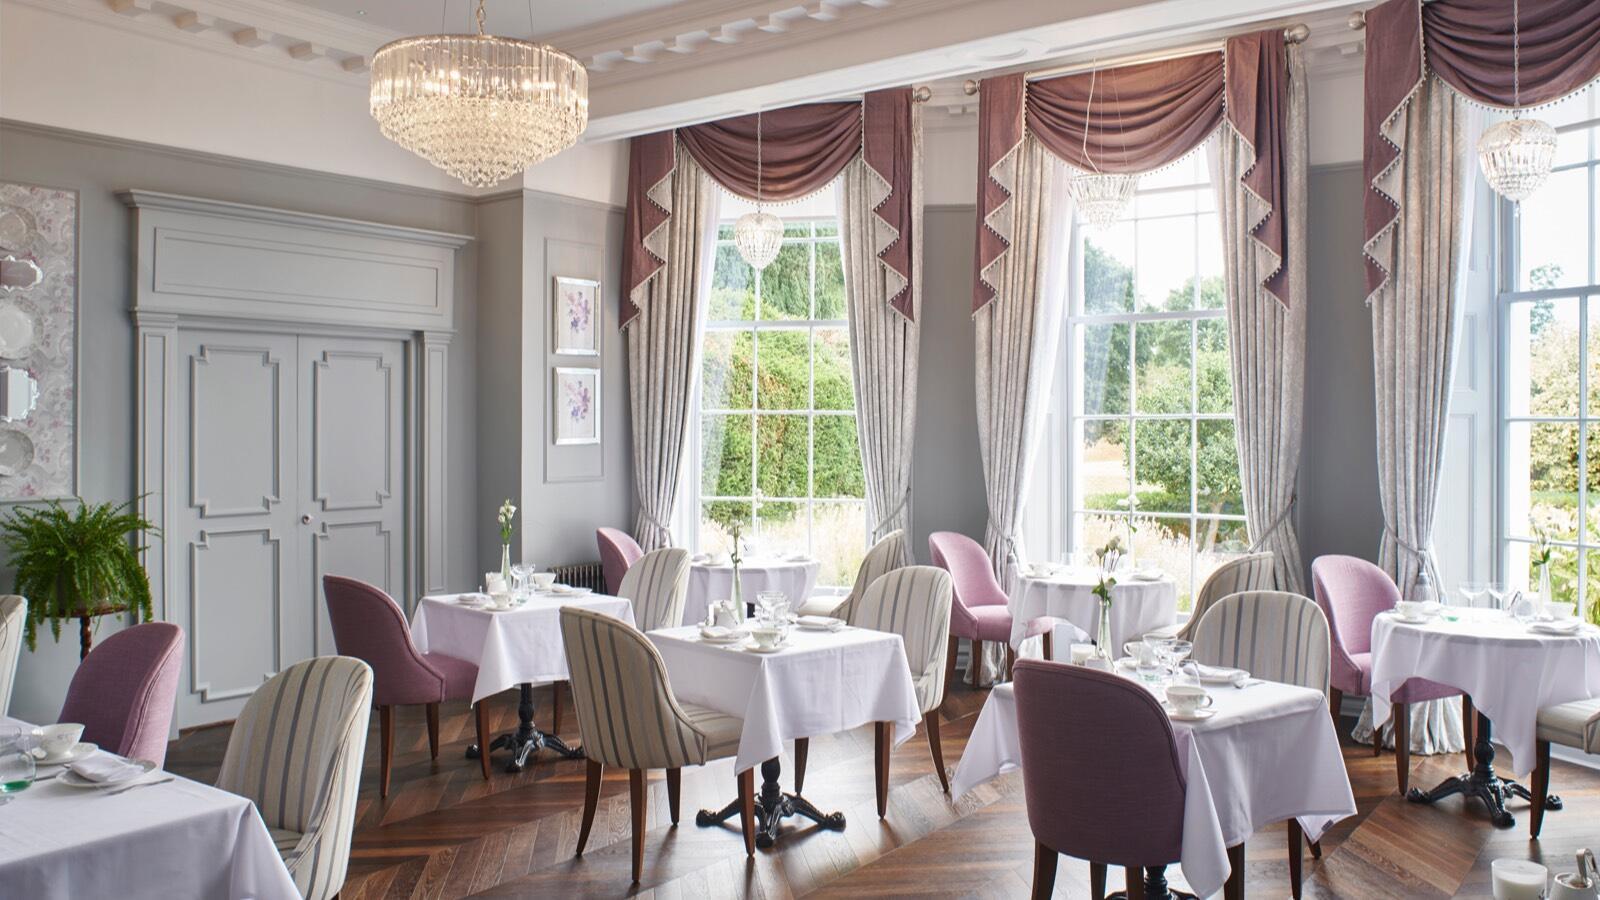 Laura Ashley The Tea Room - Burnham Beeches